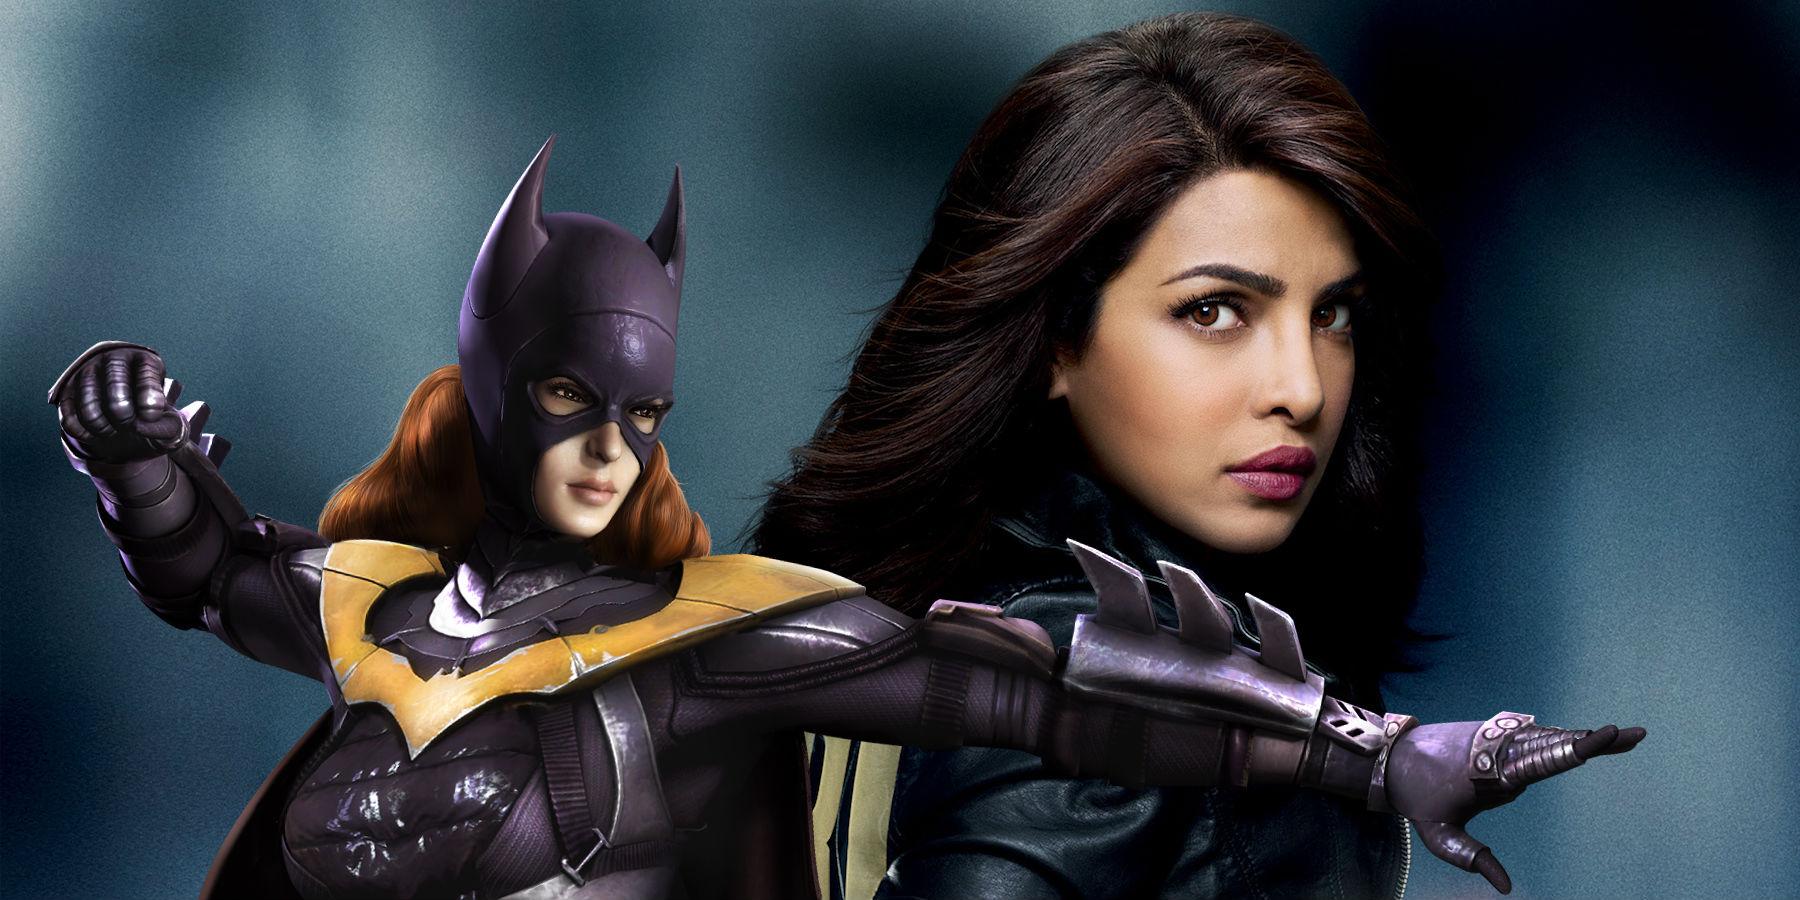 Priyanka Chopra wants to play a Batgirl